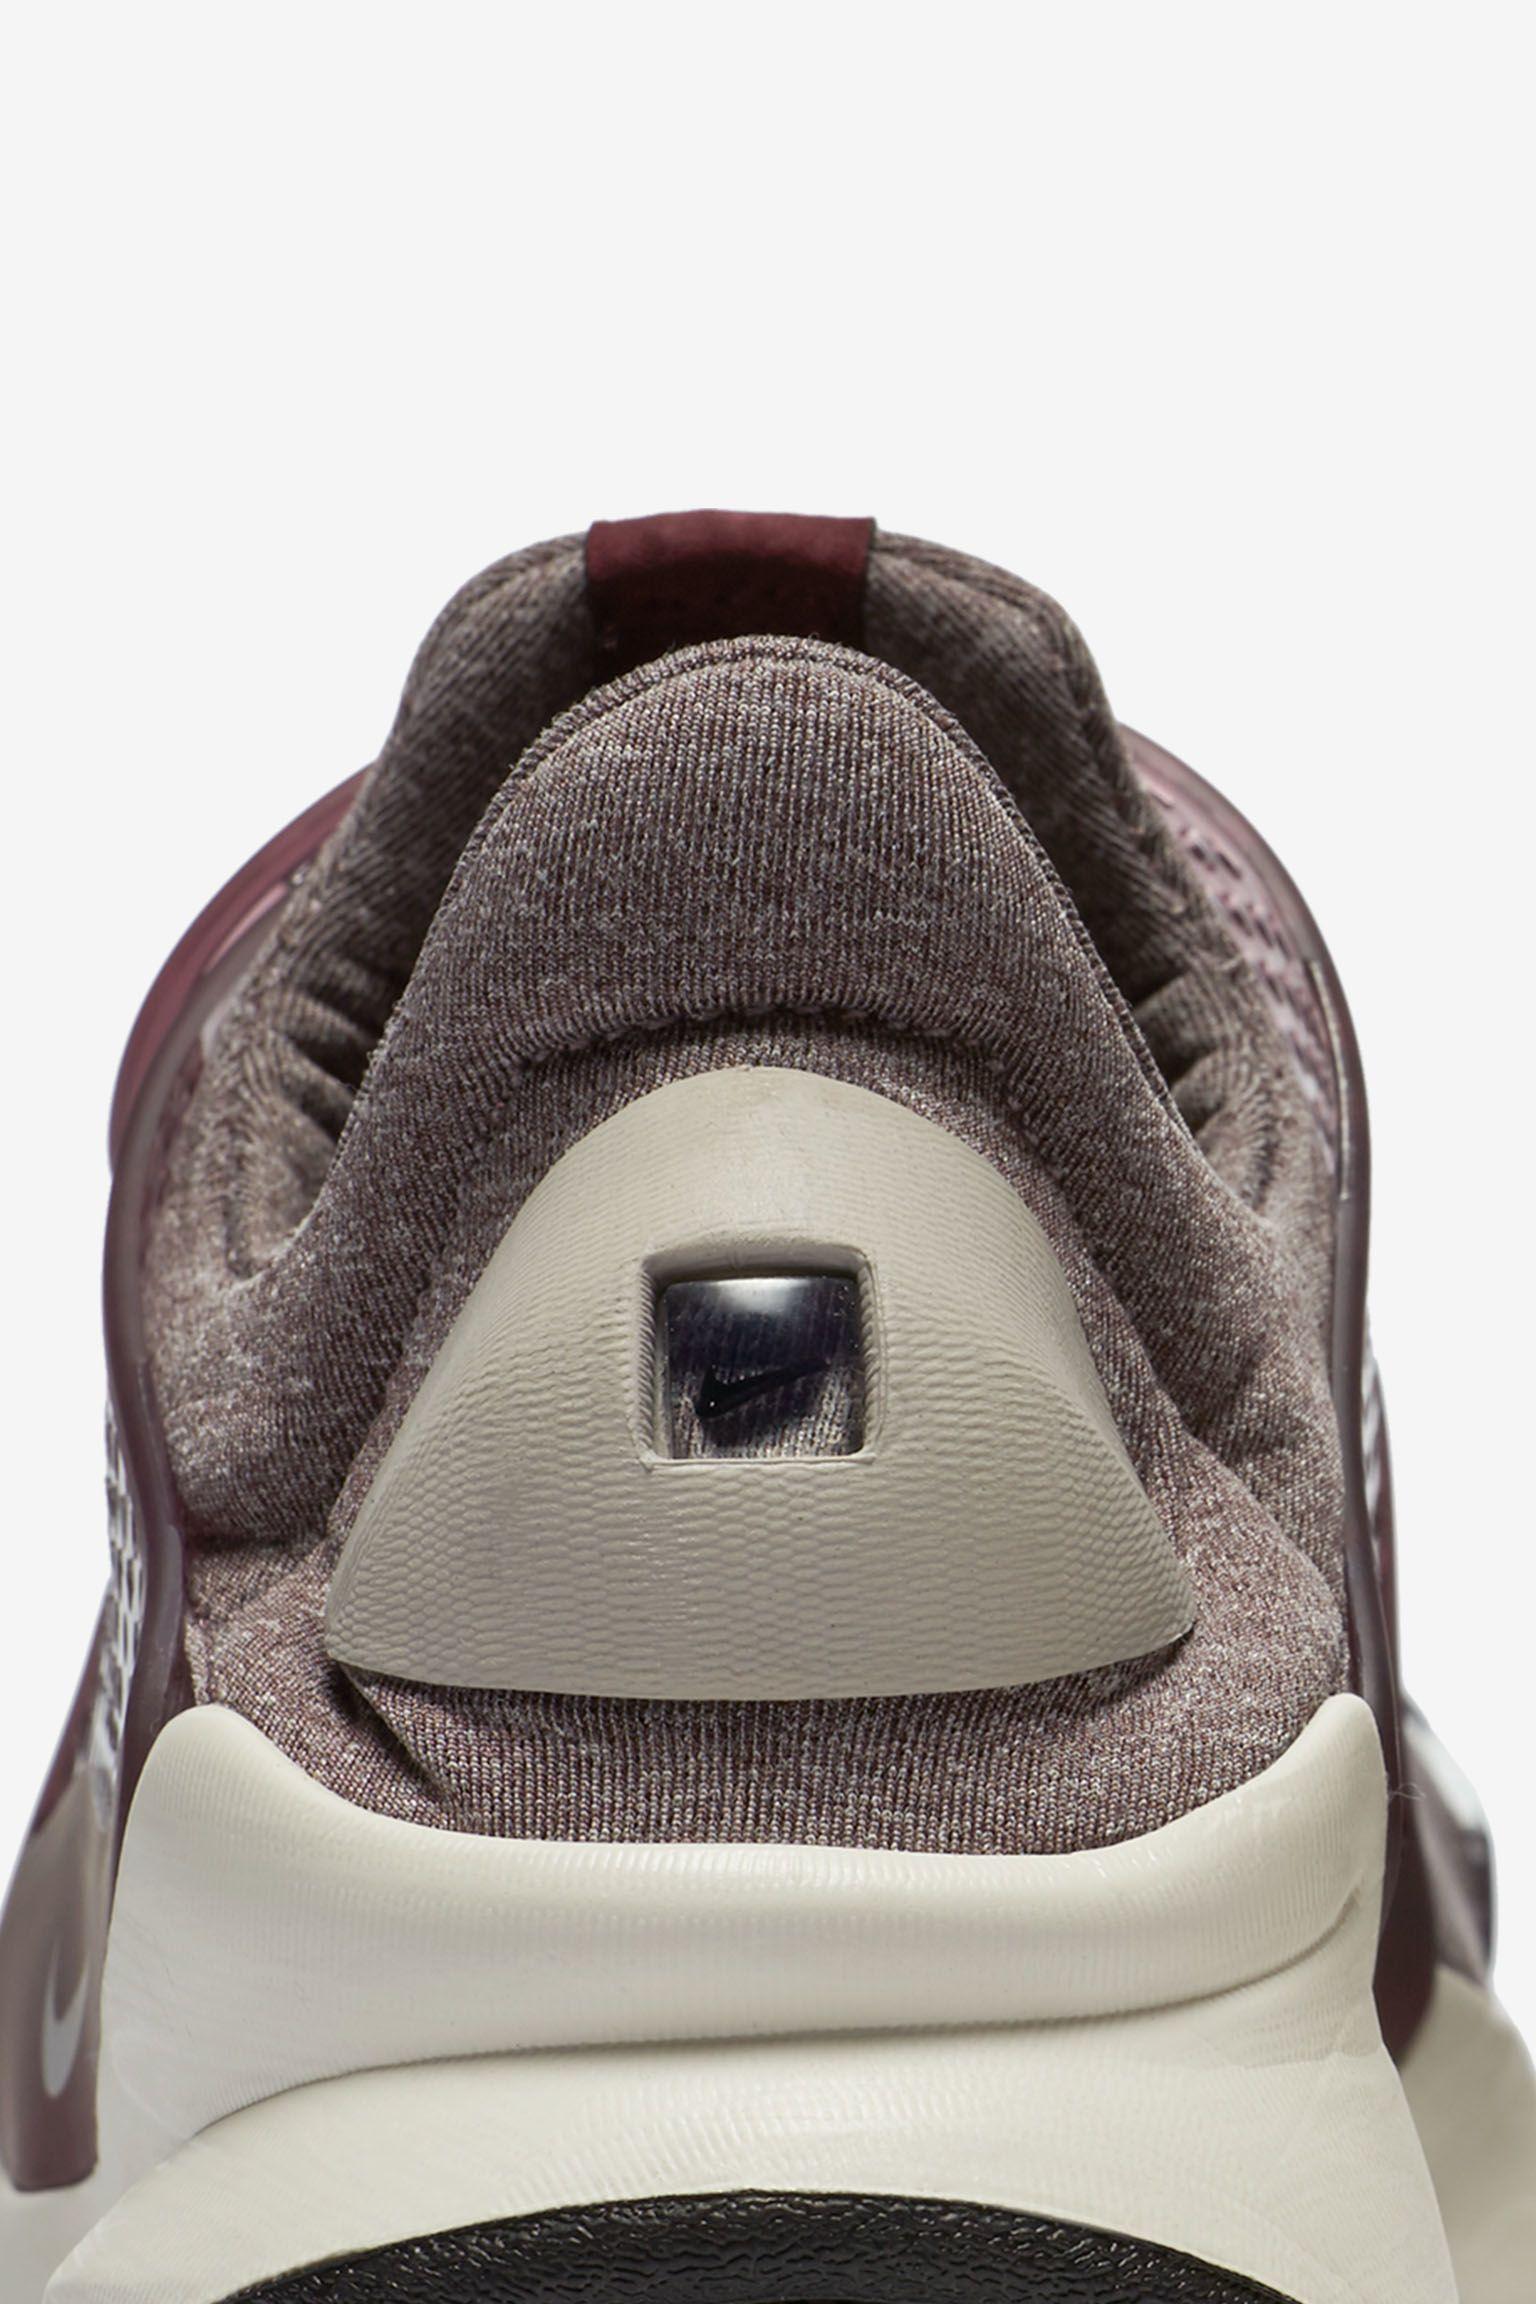 Dámská bota Nike Sock Dart 'Night Maroon'